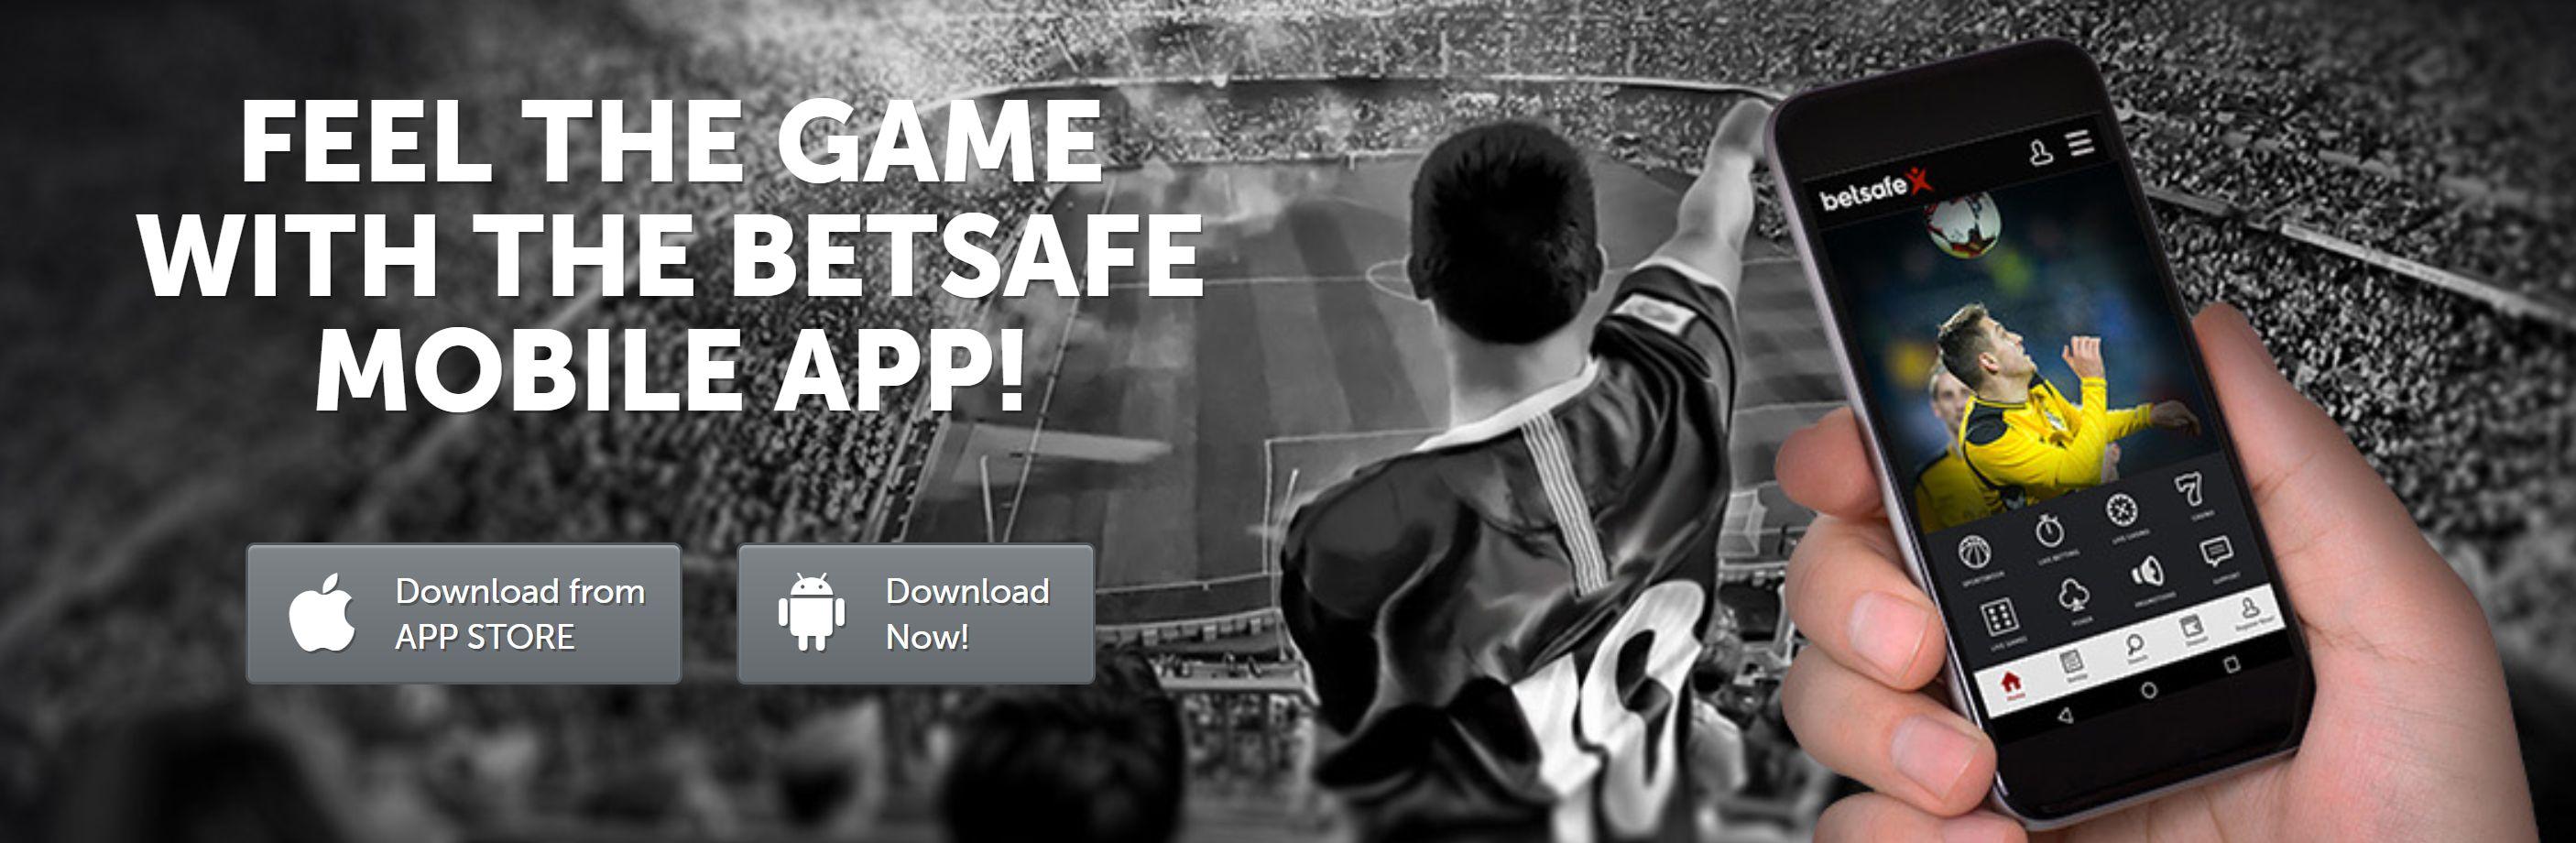 betsafe lt kazino lietuva tonybet betsafe mobile app